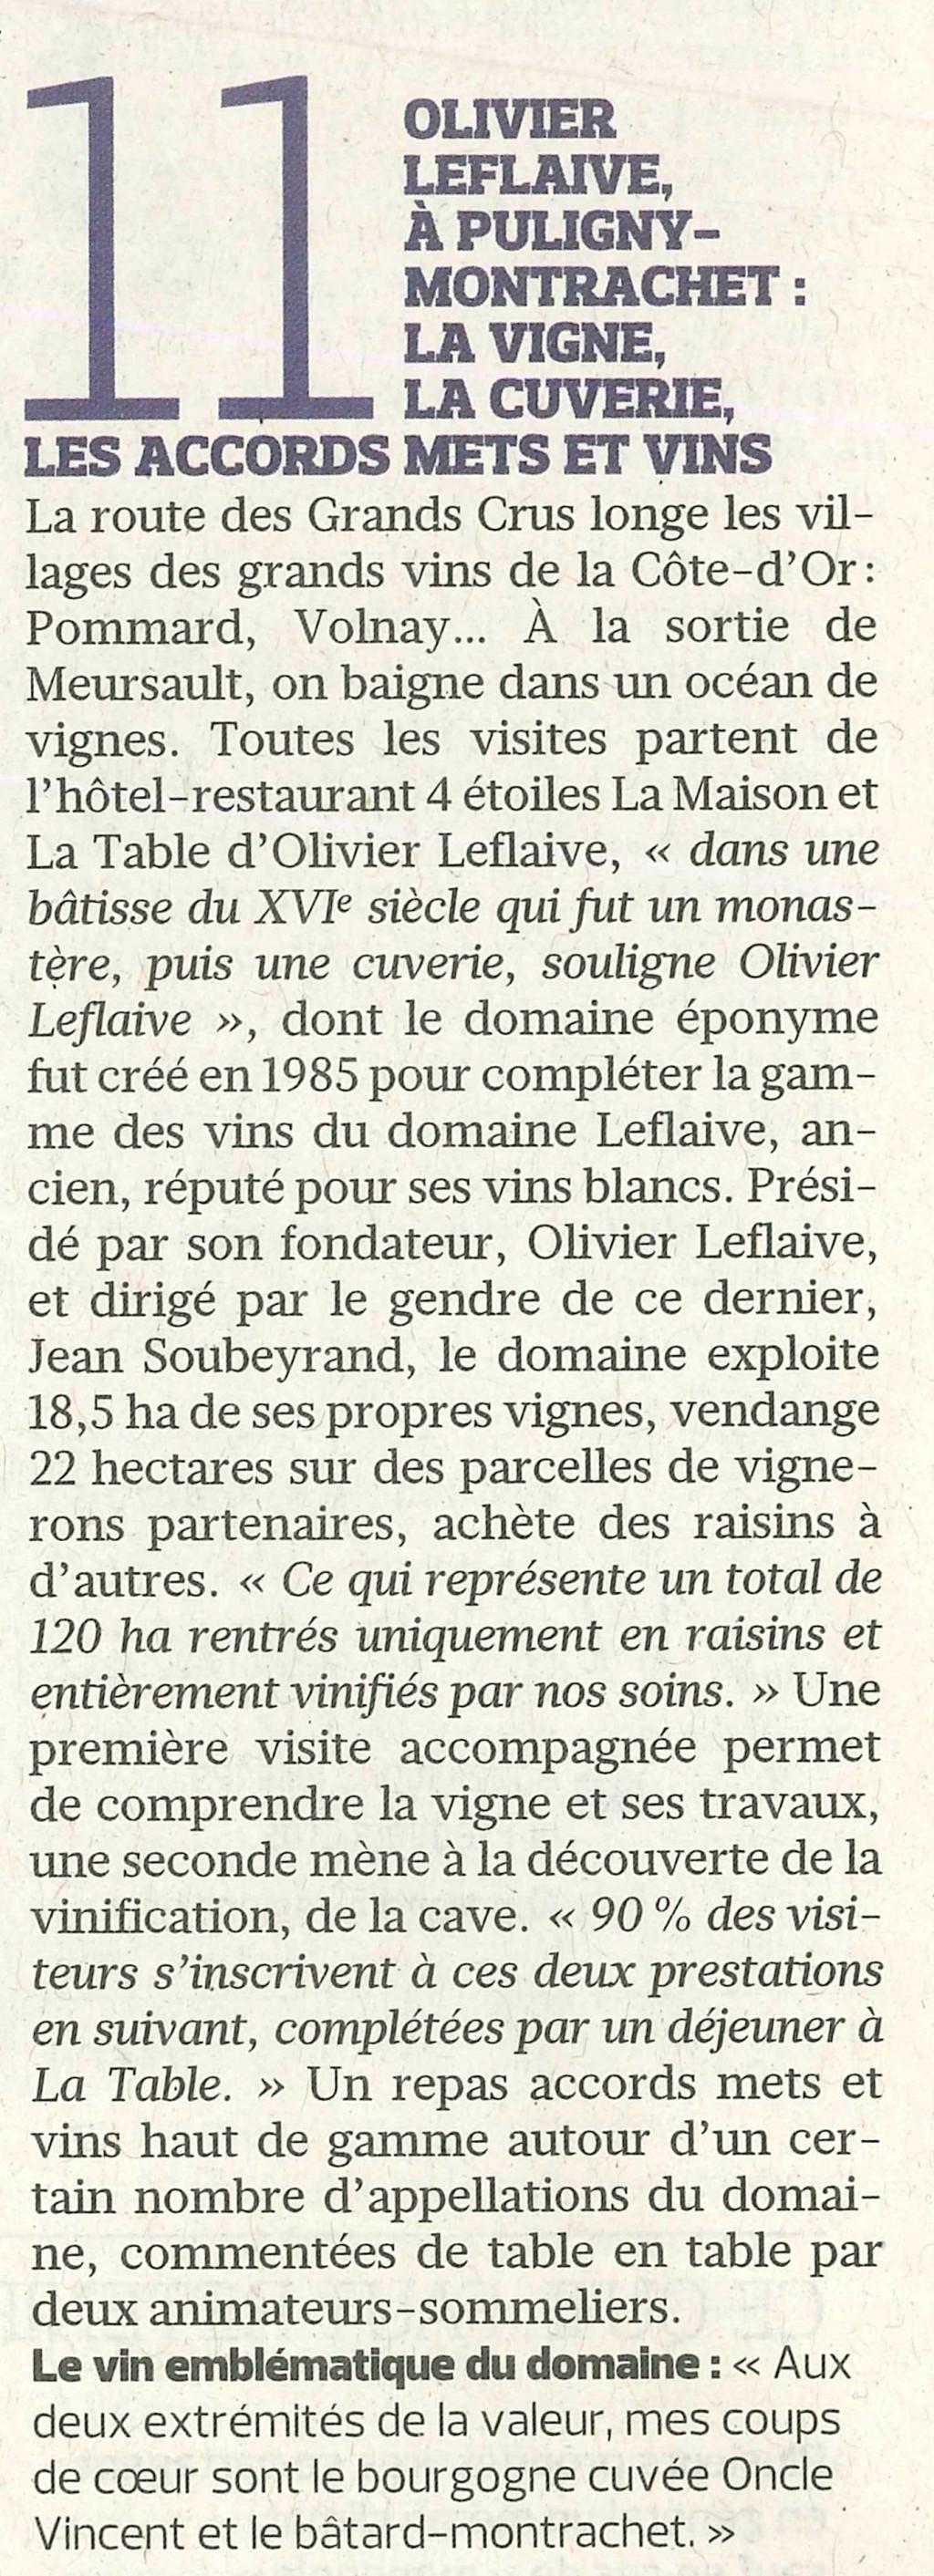 Le figaro mercredi 13 avril 2016 olivier leflaive - La table d olivier leflaive puligny montrachet ...